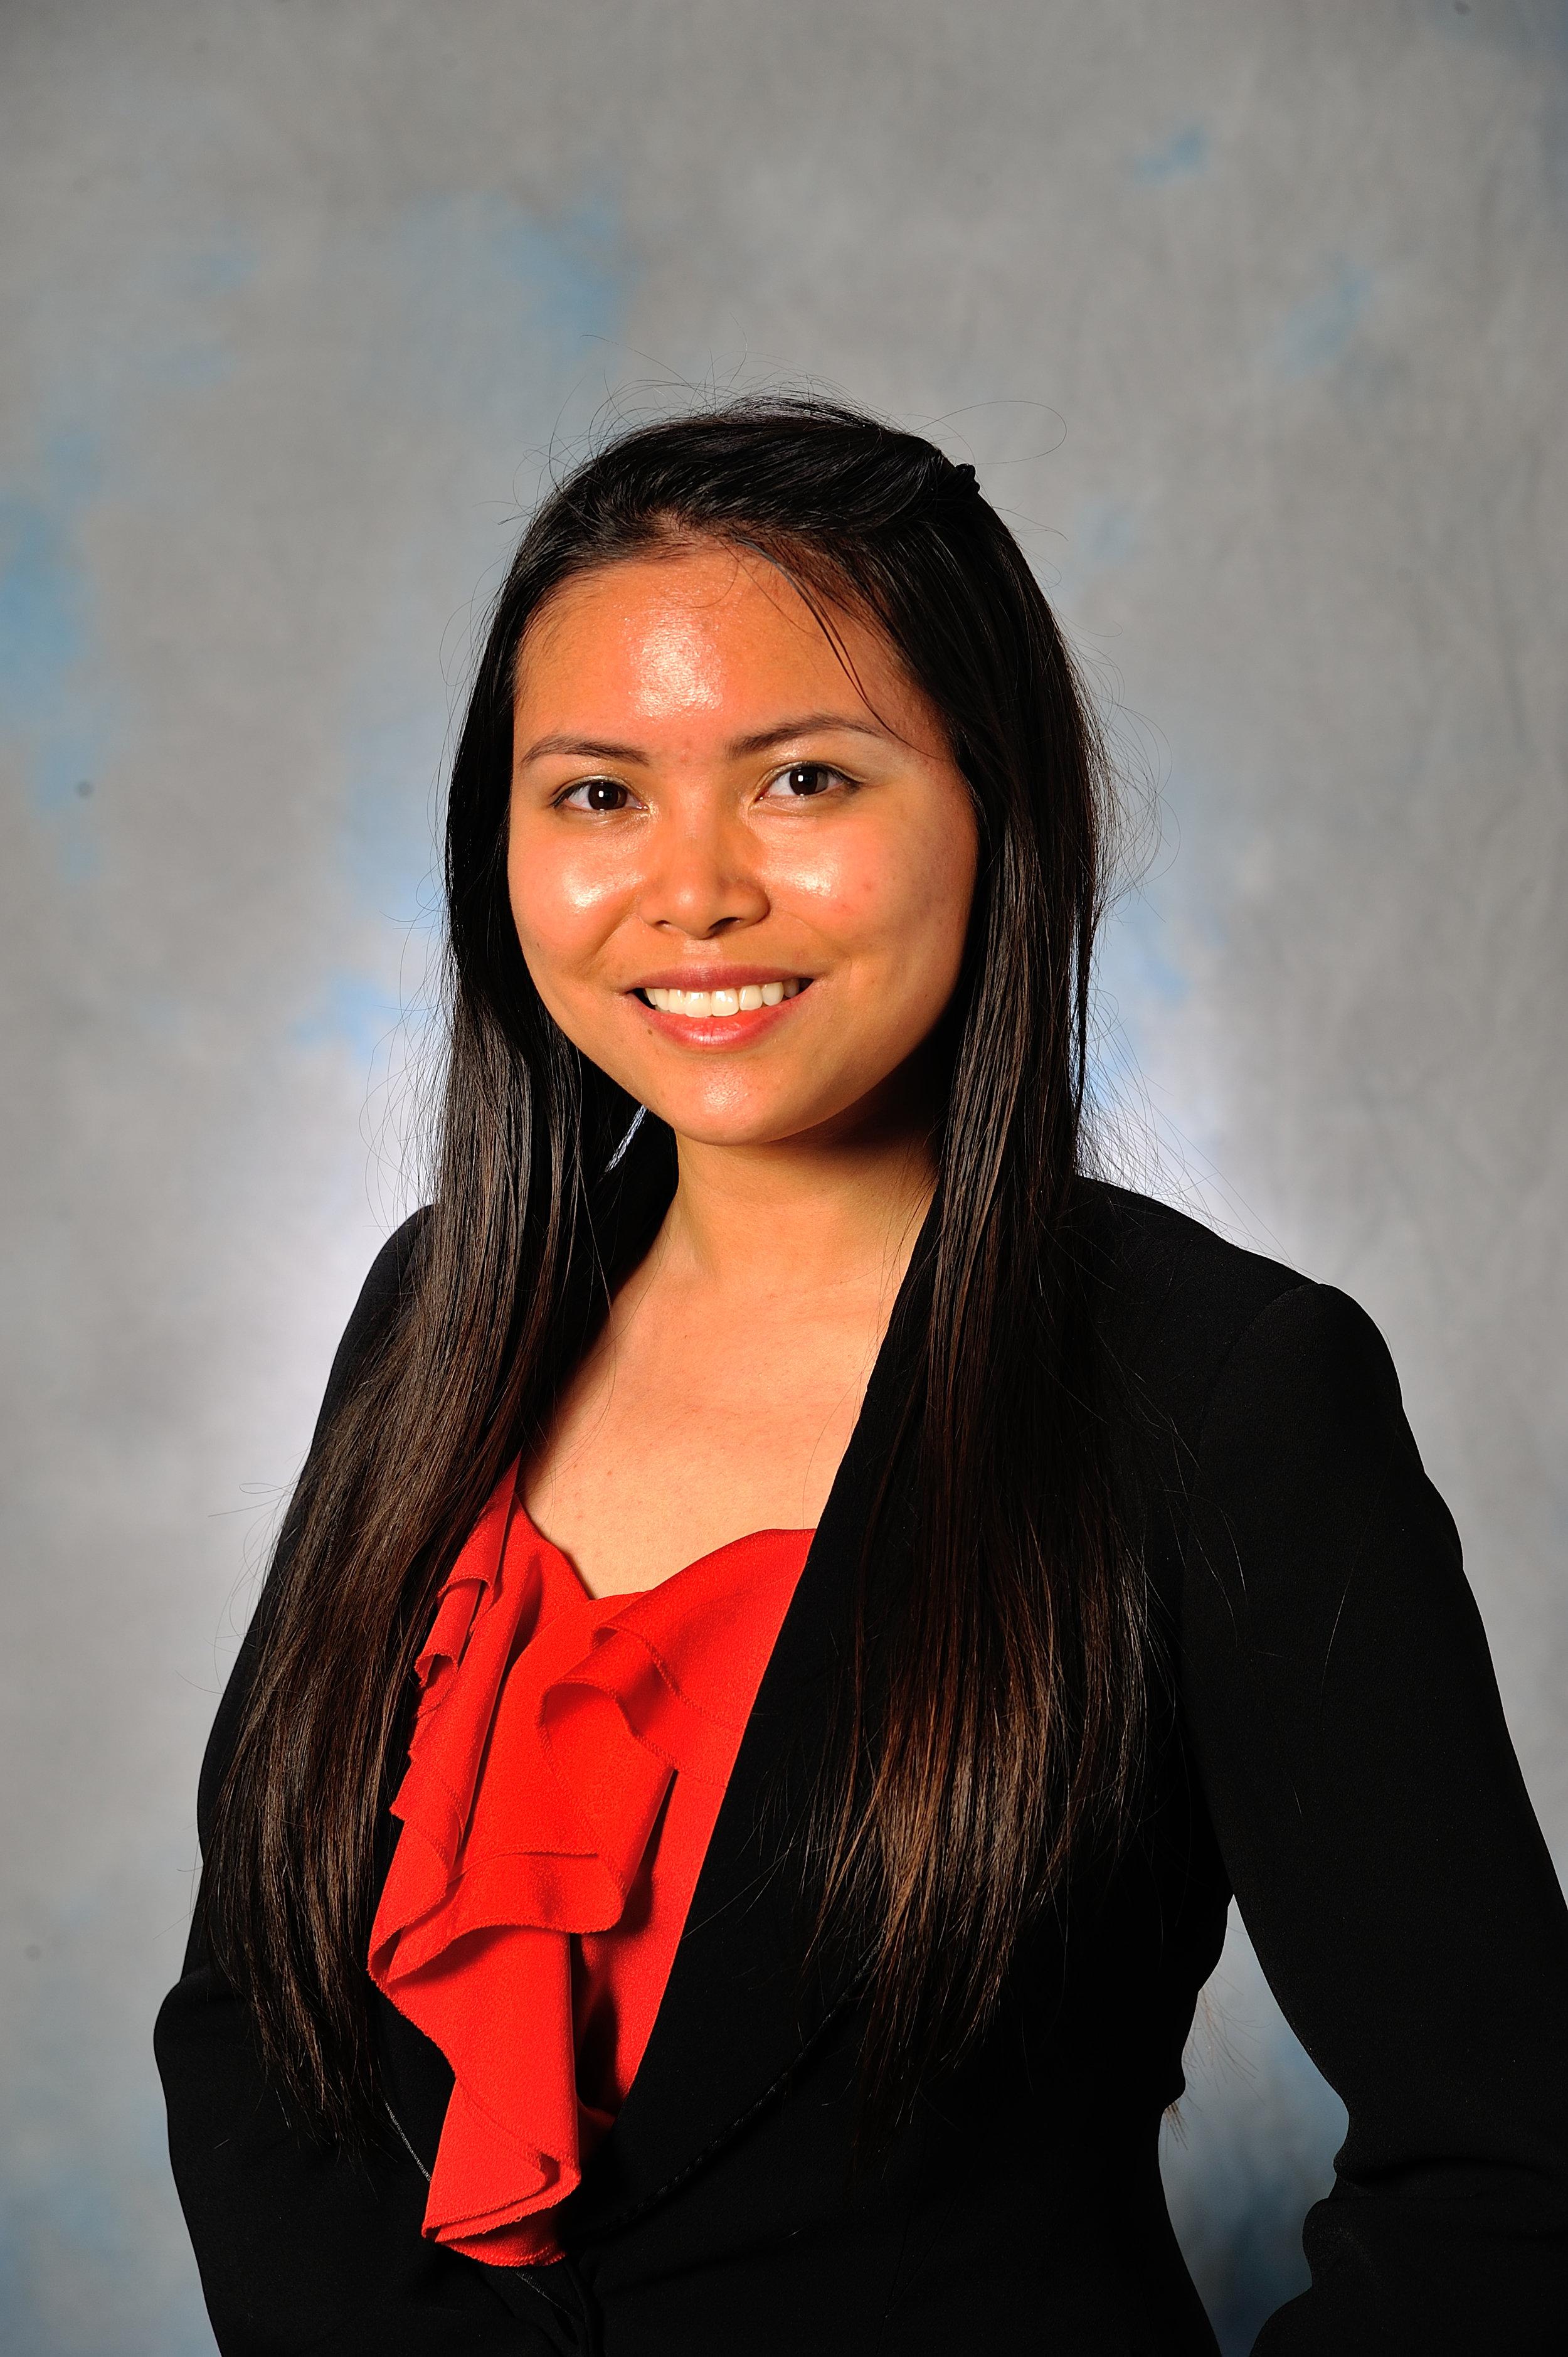 Ngan Nguyen - LCEP Program '18-'19Rho Chi Vice President '17-'18Rho Chi MemberAPhA Vice President of Patient Care '17-'18UHCOP c/o 2019 Historian '15-'16; '16-'17; '17-'18; '18-'19APhA Operation Diabetes Co-Chair '16-'17VAPSS Cultural Awareness Co-Chair '16-'17